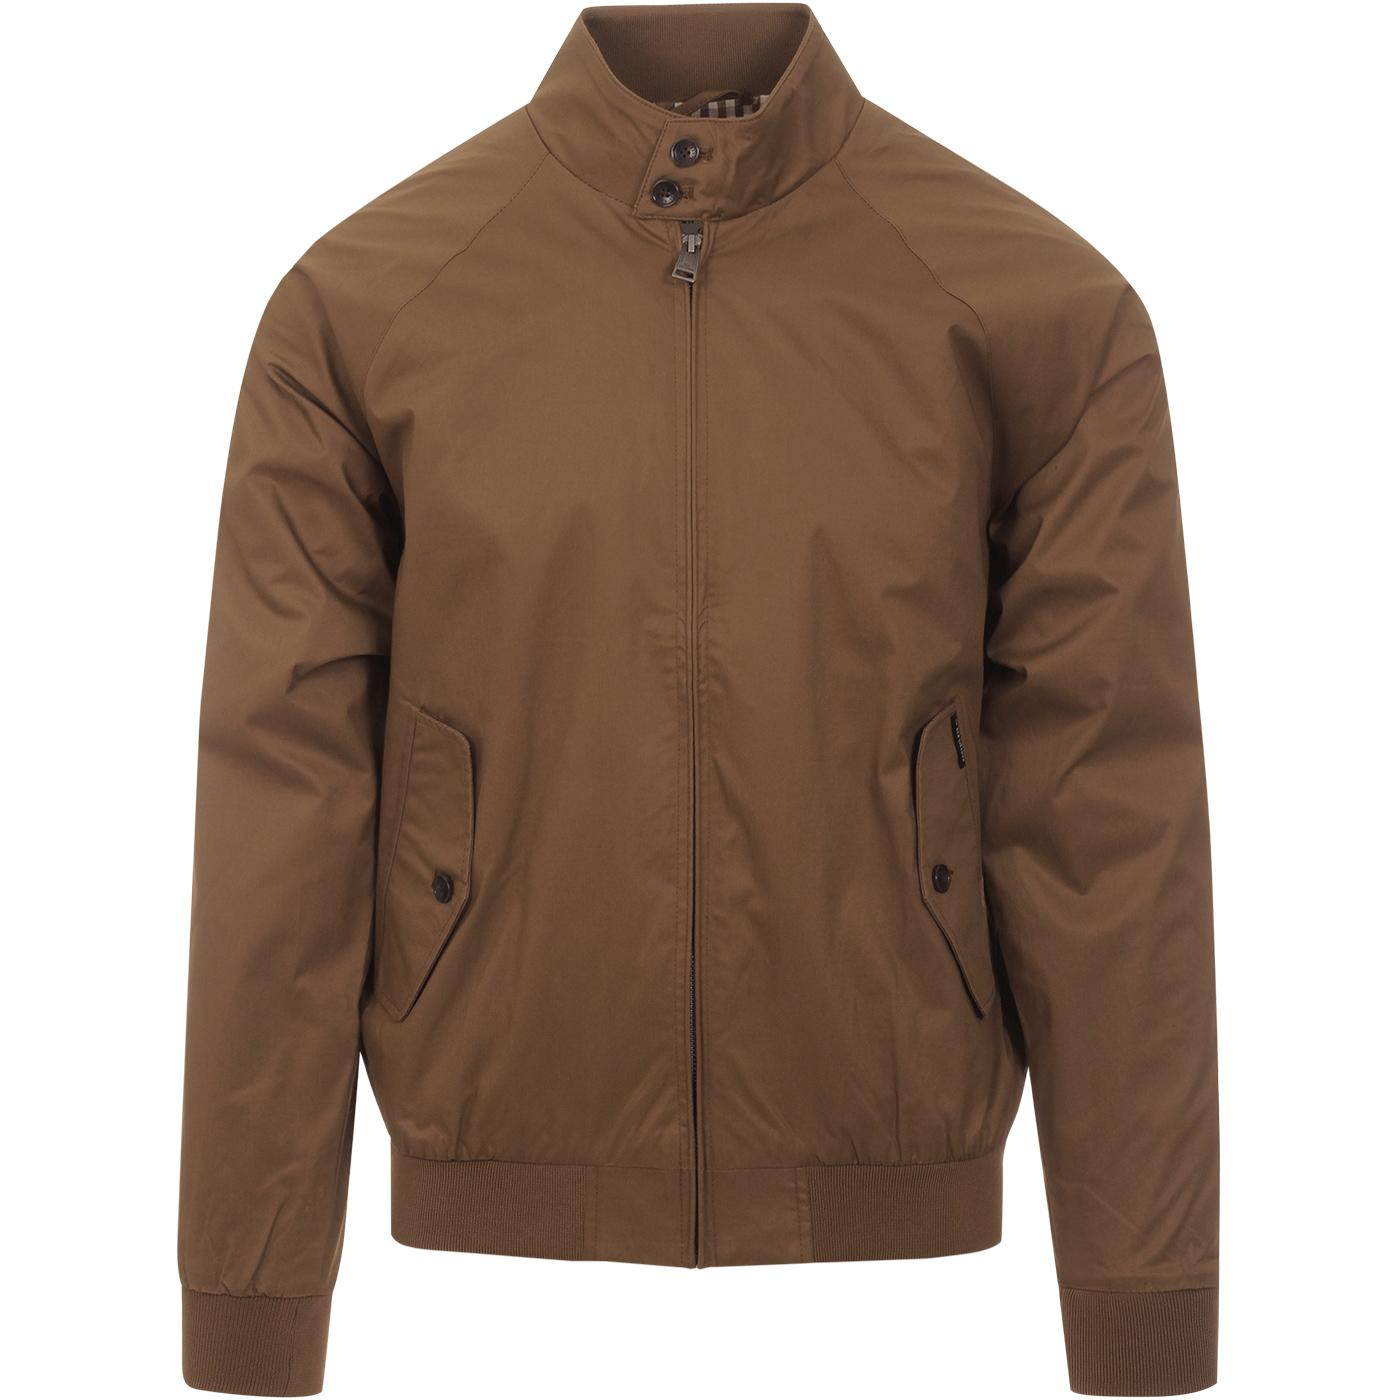 BEN SHERMAN Men's 60s Mod Harrintgton Jacket TAN